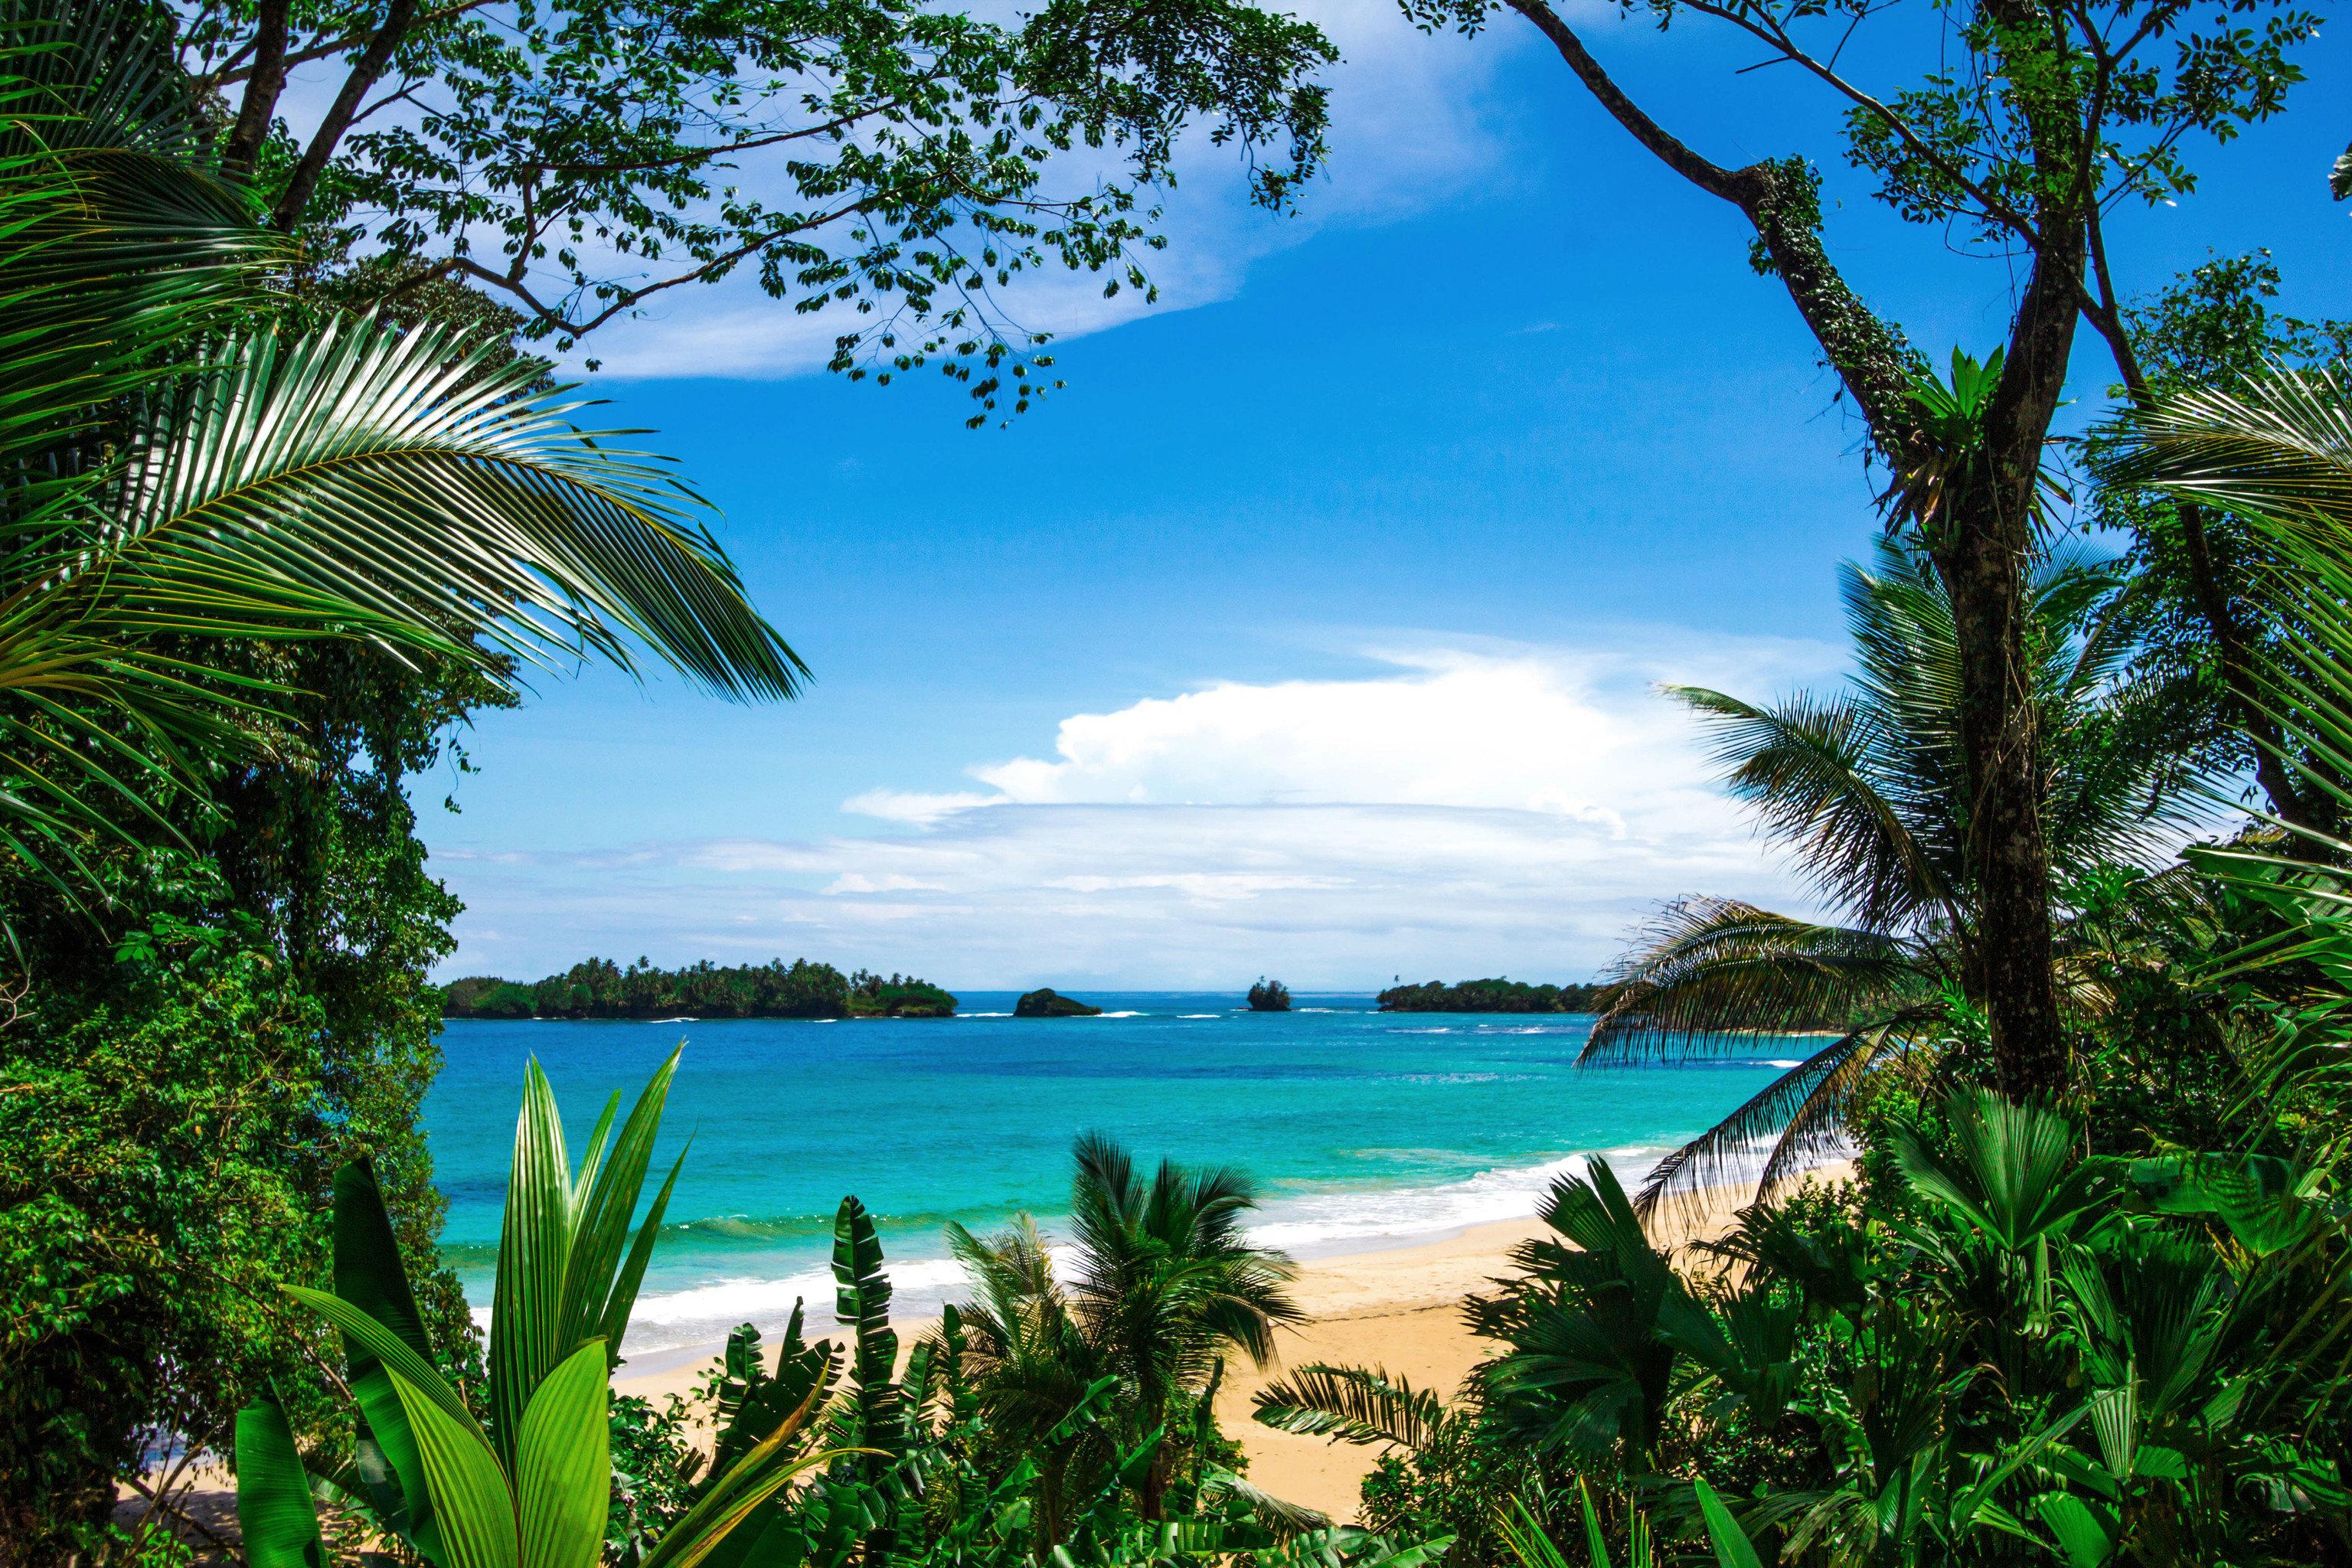 tree palm water sky habitat vegetation Beach caribbean tropics ecosystem Ocean Sea Coast palm family arecales Jungle Resort Lagoon Island plant rainforest lined shade shore overlooking beautiful sandy